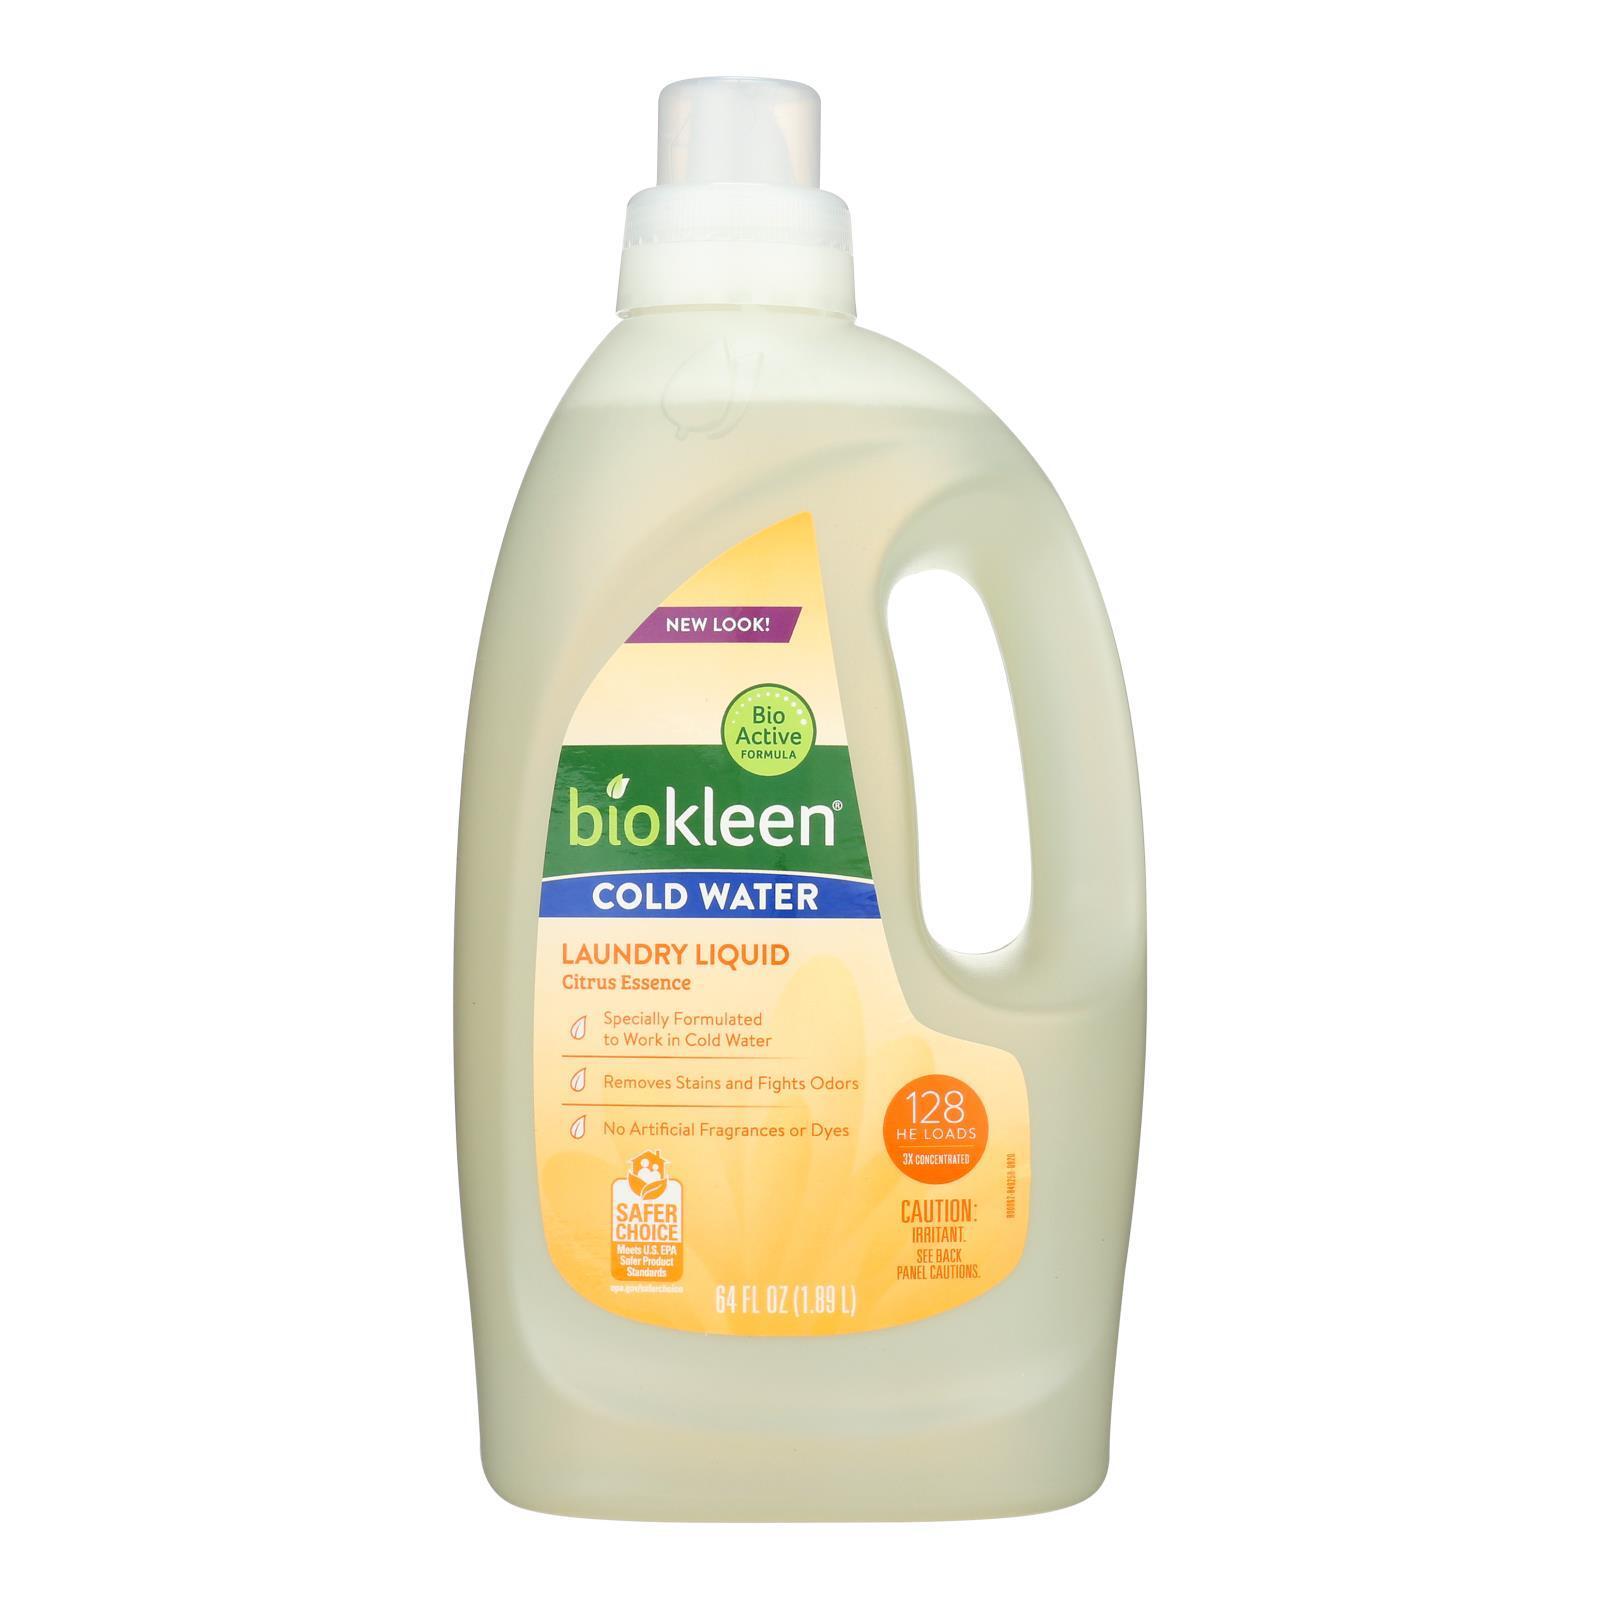 Biokleen Laundry Liquid - Cold Water Formula - 64 oz